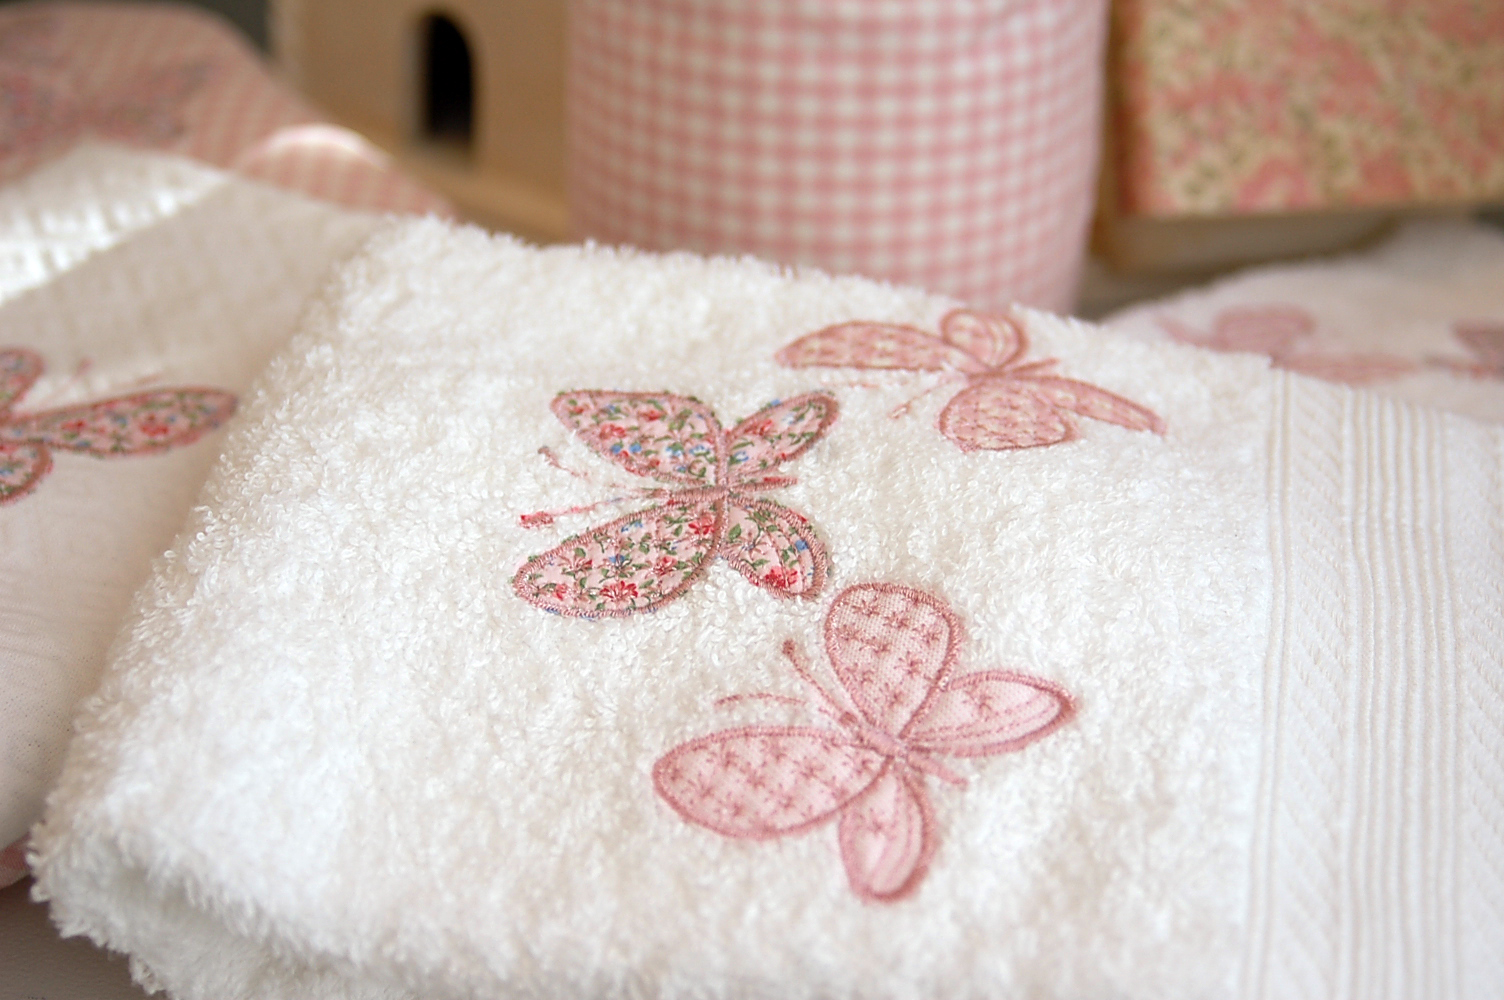 Paz montealegre decoraci n toallas bordadas toallas con - Decoracion con toallas ...